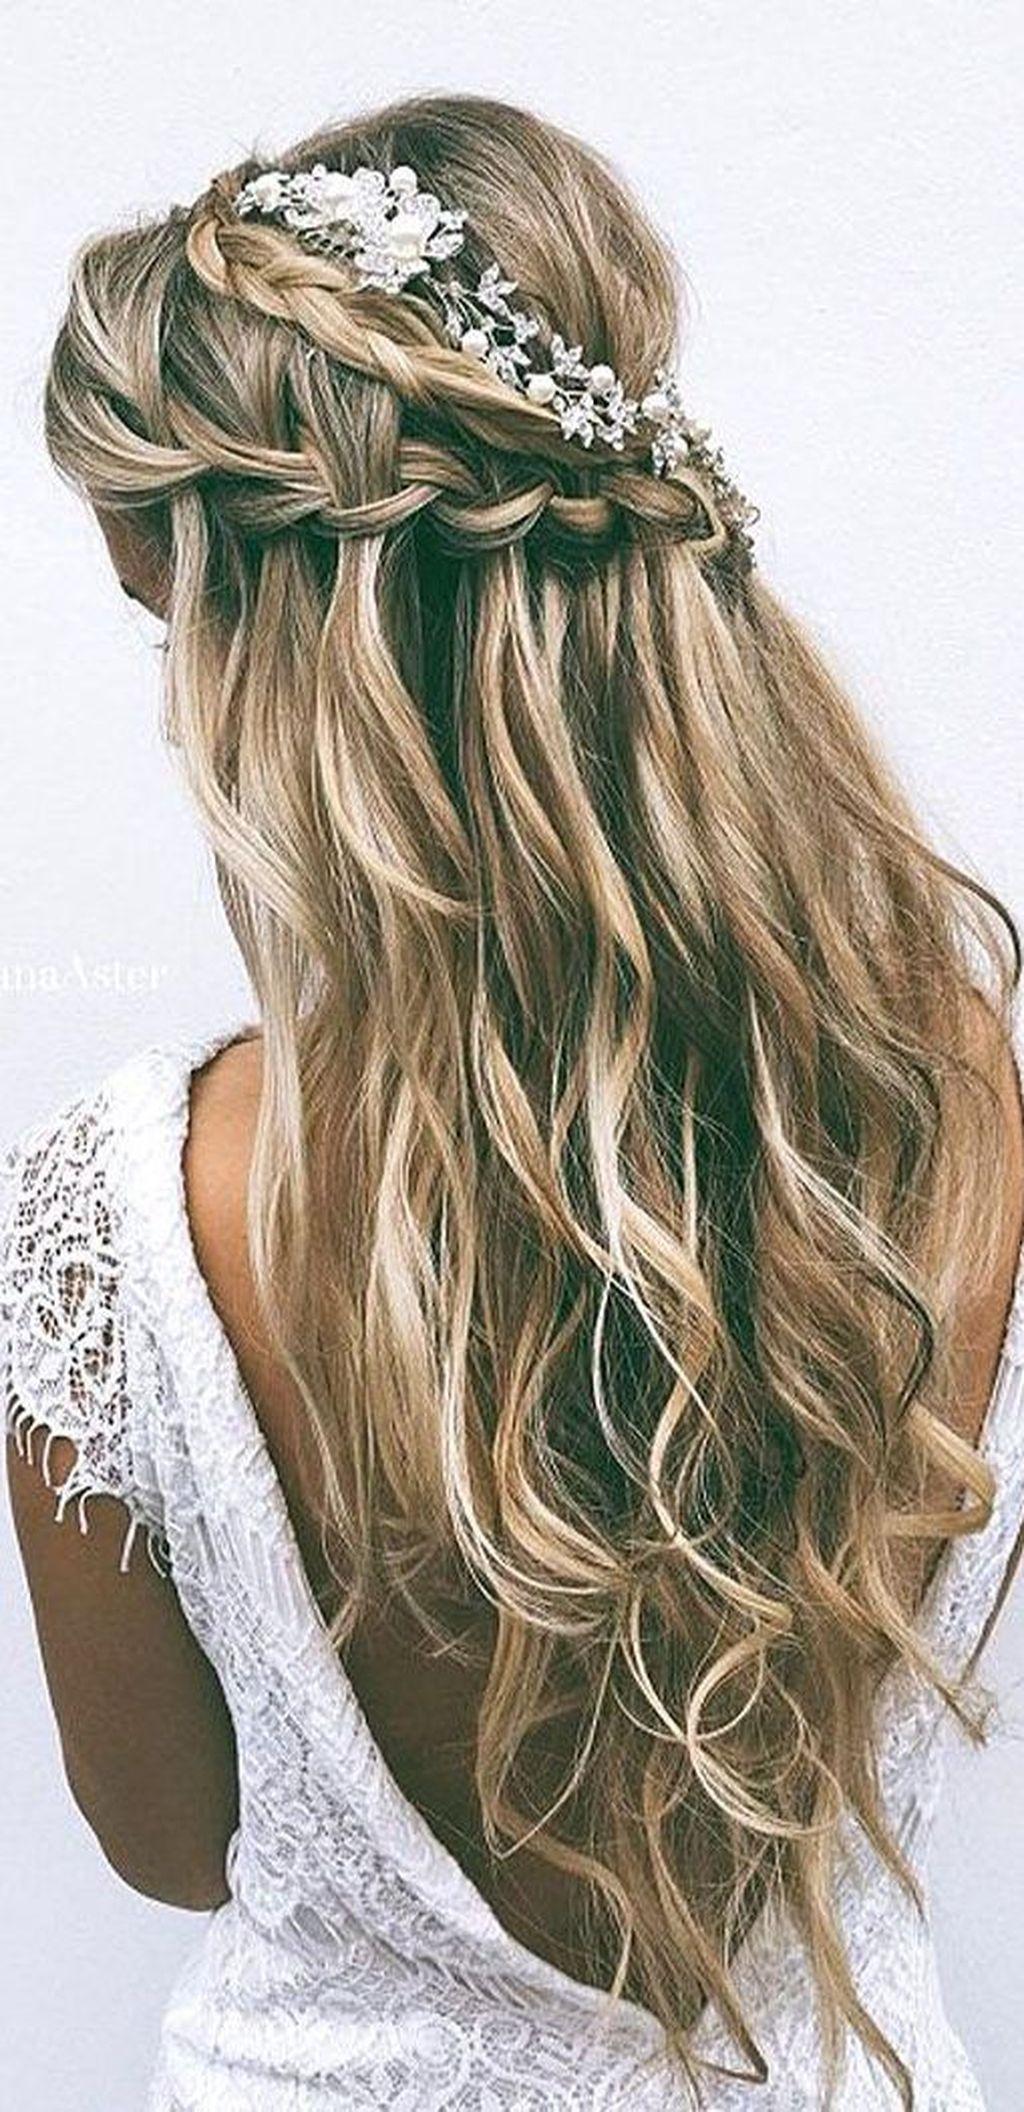 classy wedding hairstyle ideas for long hair women thicker hair